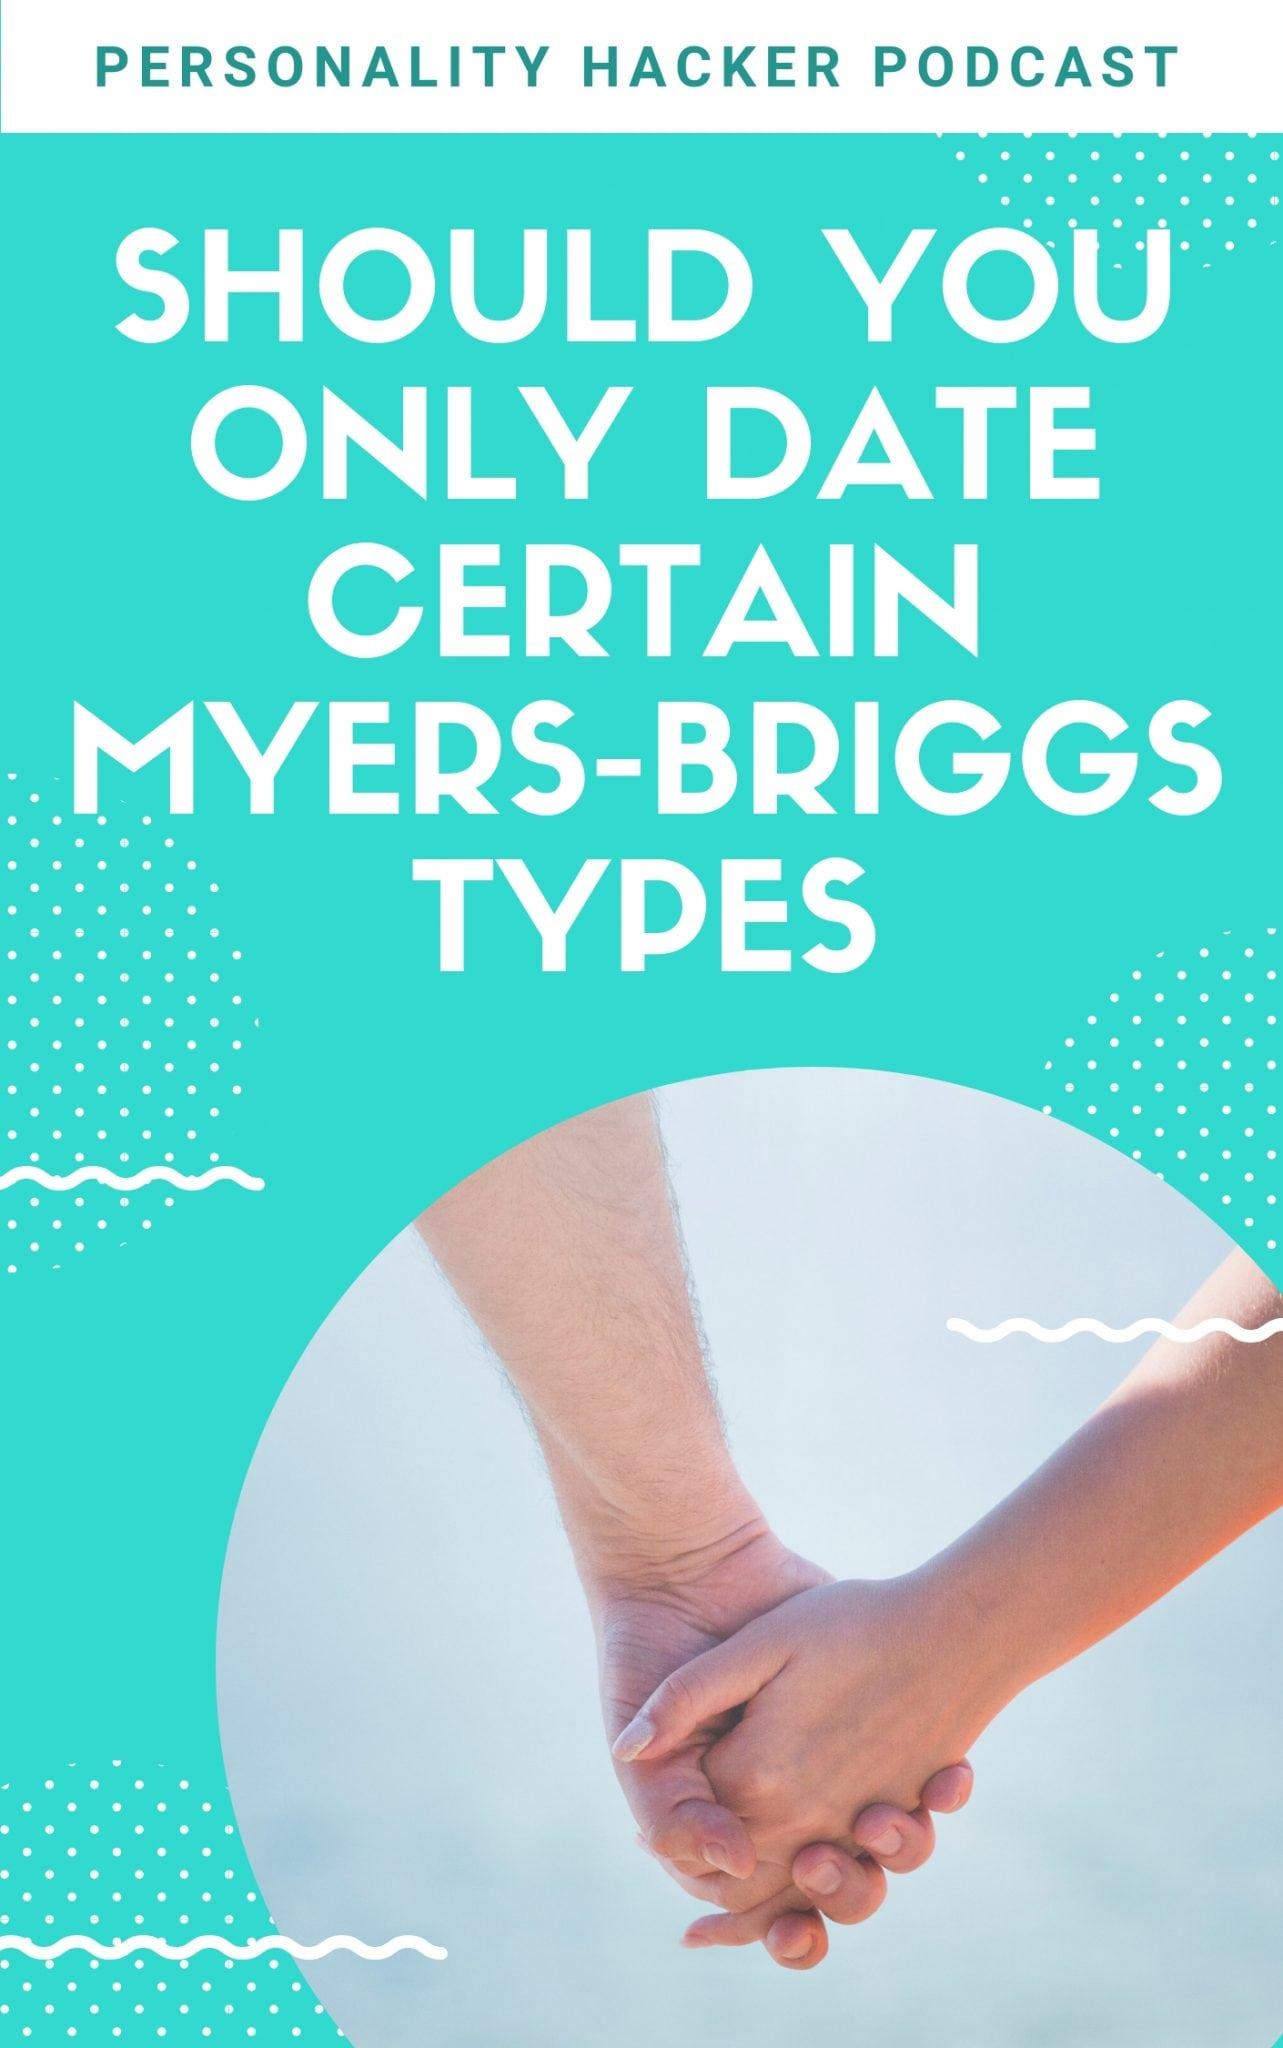 Vapaa paras dating sites UK